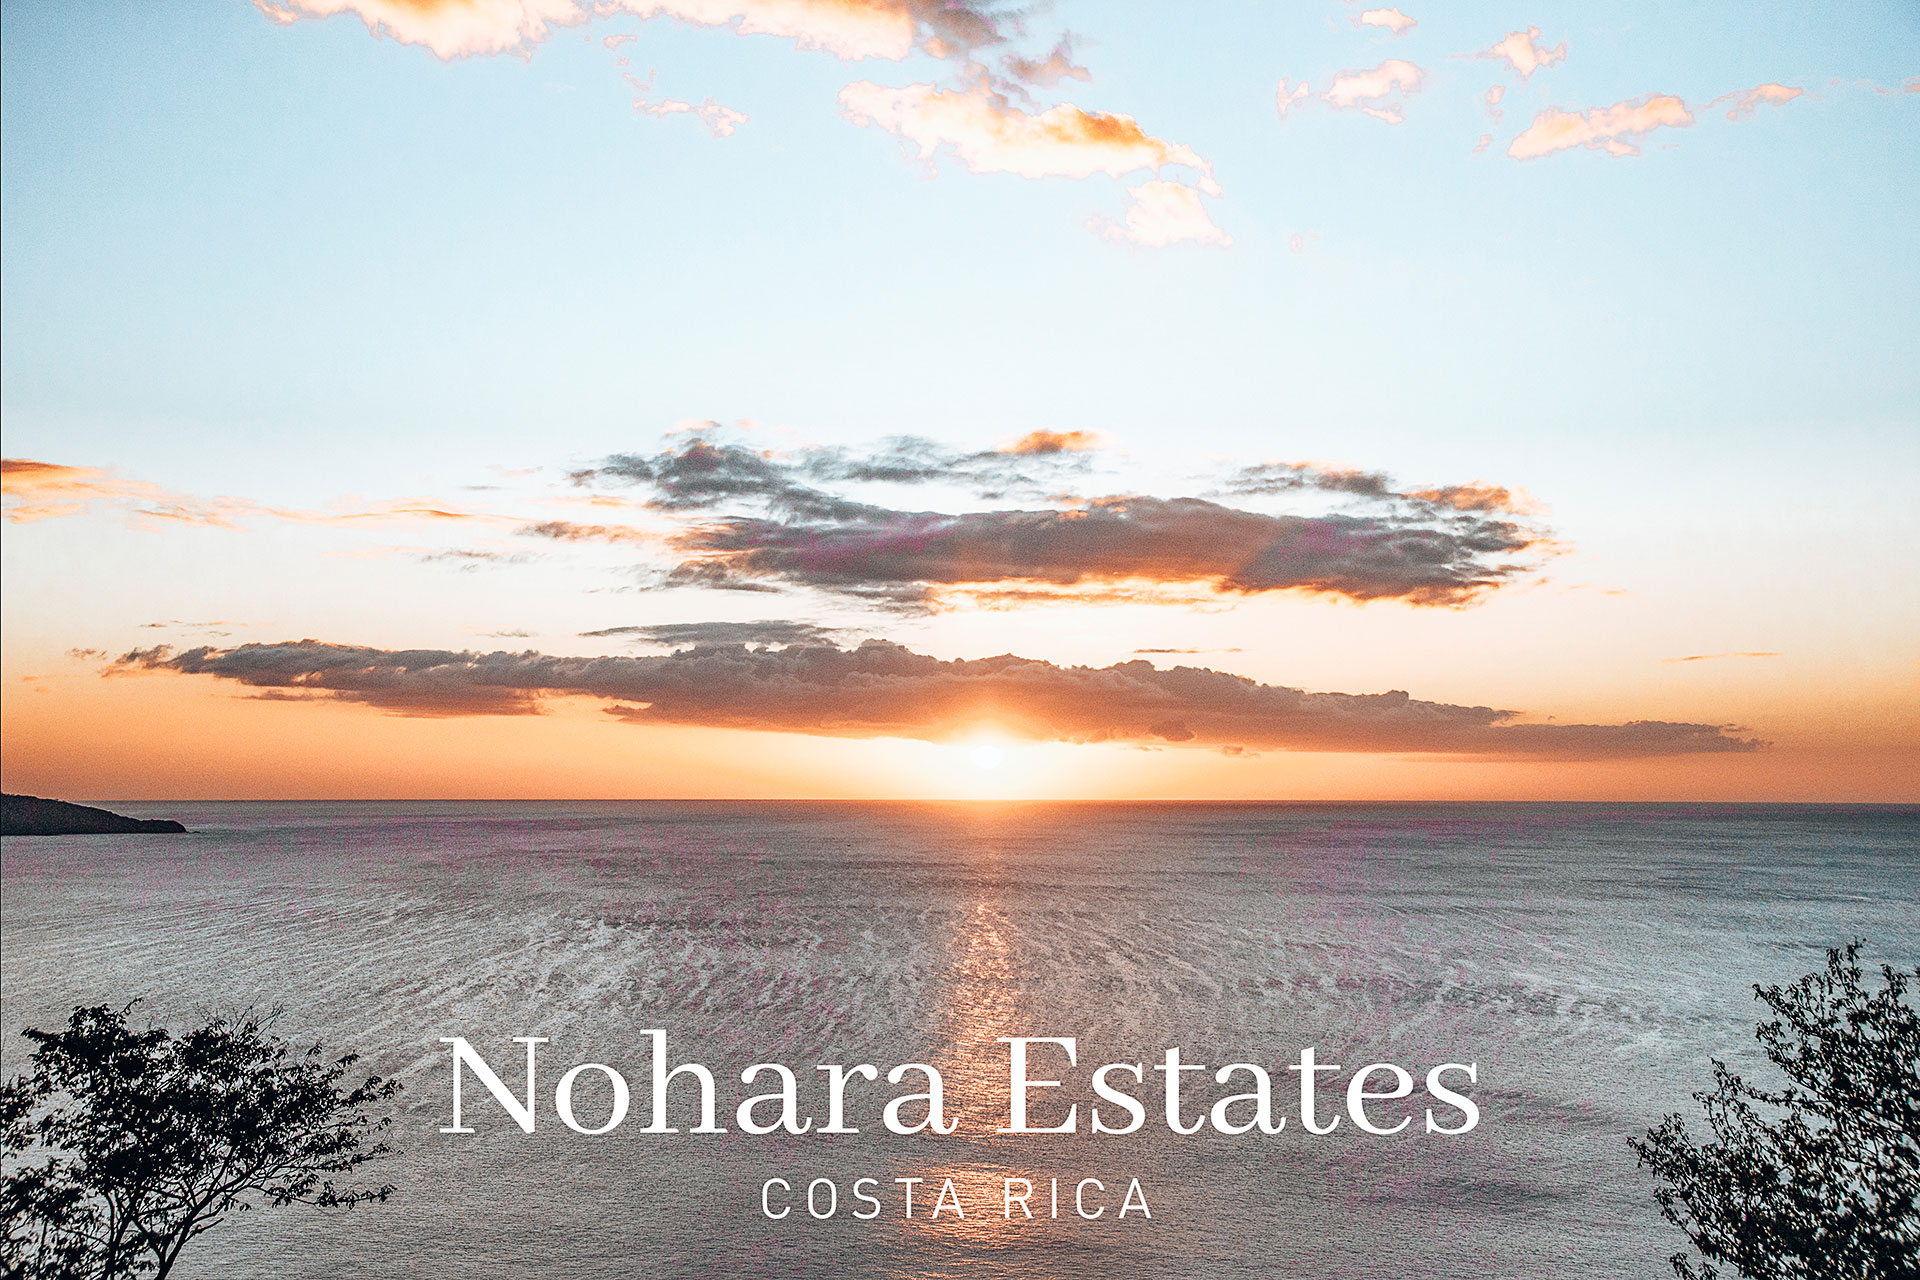 Nohara Estates Costa Rica 360 Esplendor Del Pacifico Area 28